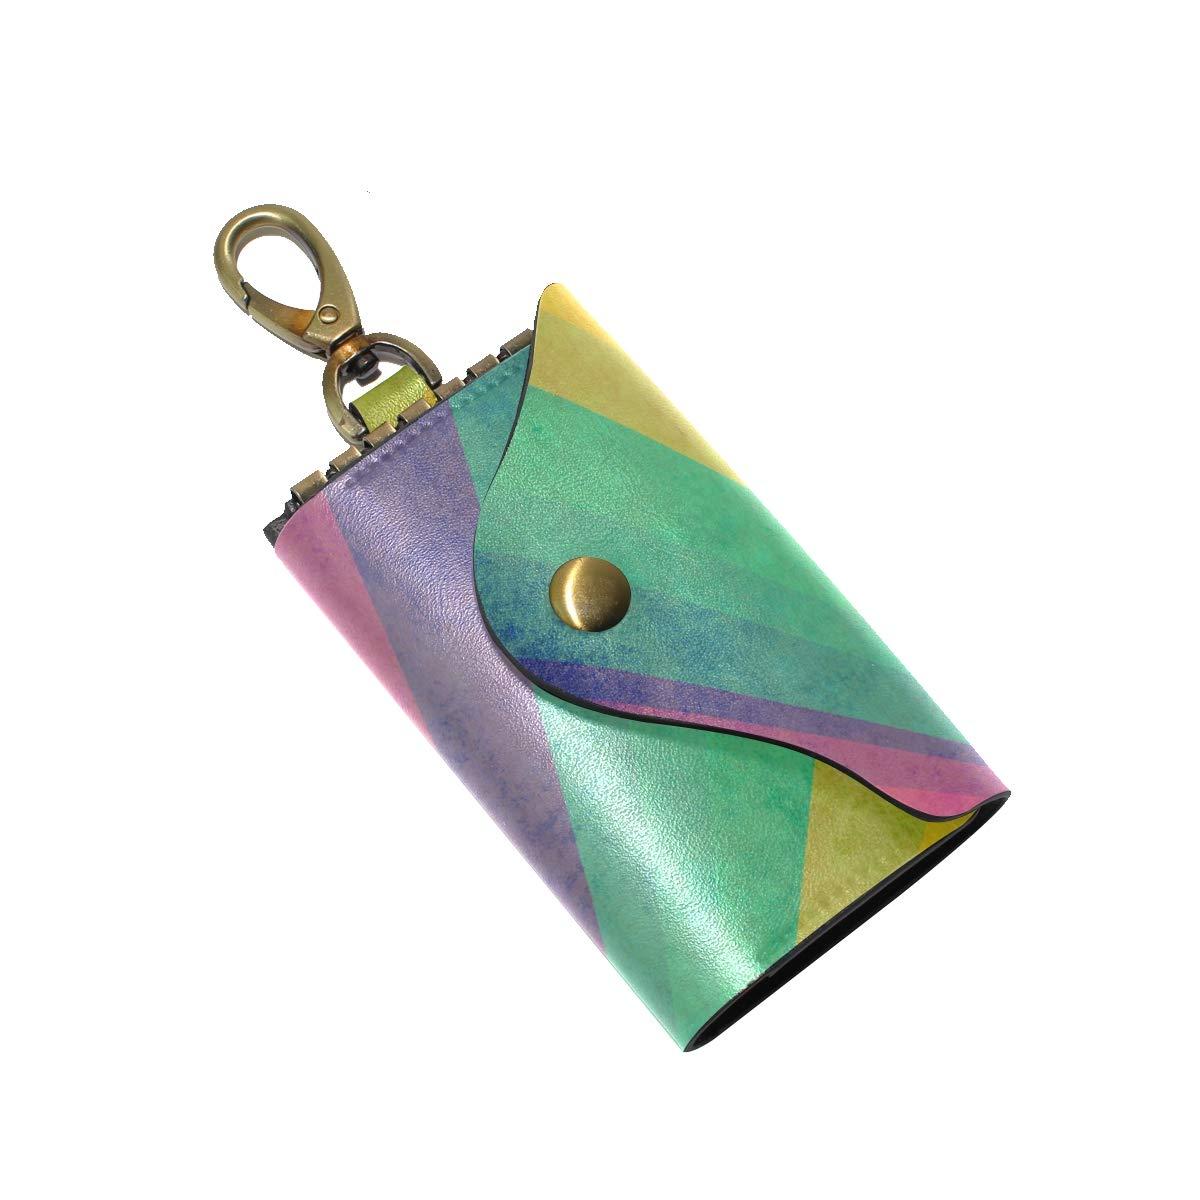 KEAKIA Vintage Sunbeams Ranibow Leather Key Case Wallets Tri-fold Key Holder Keychains with 6 Hooks 2 Slot Snap Closure for Men Women